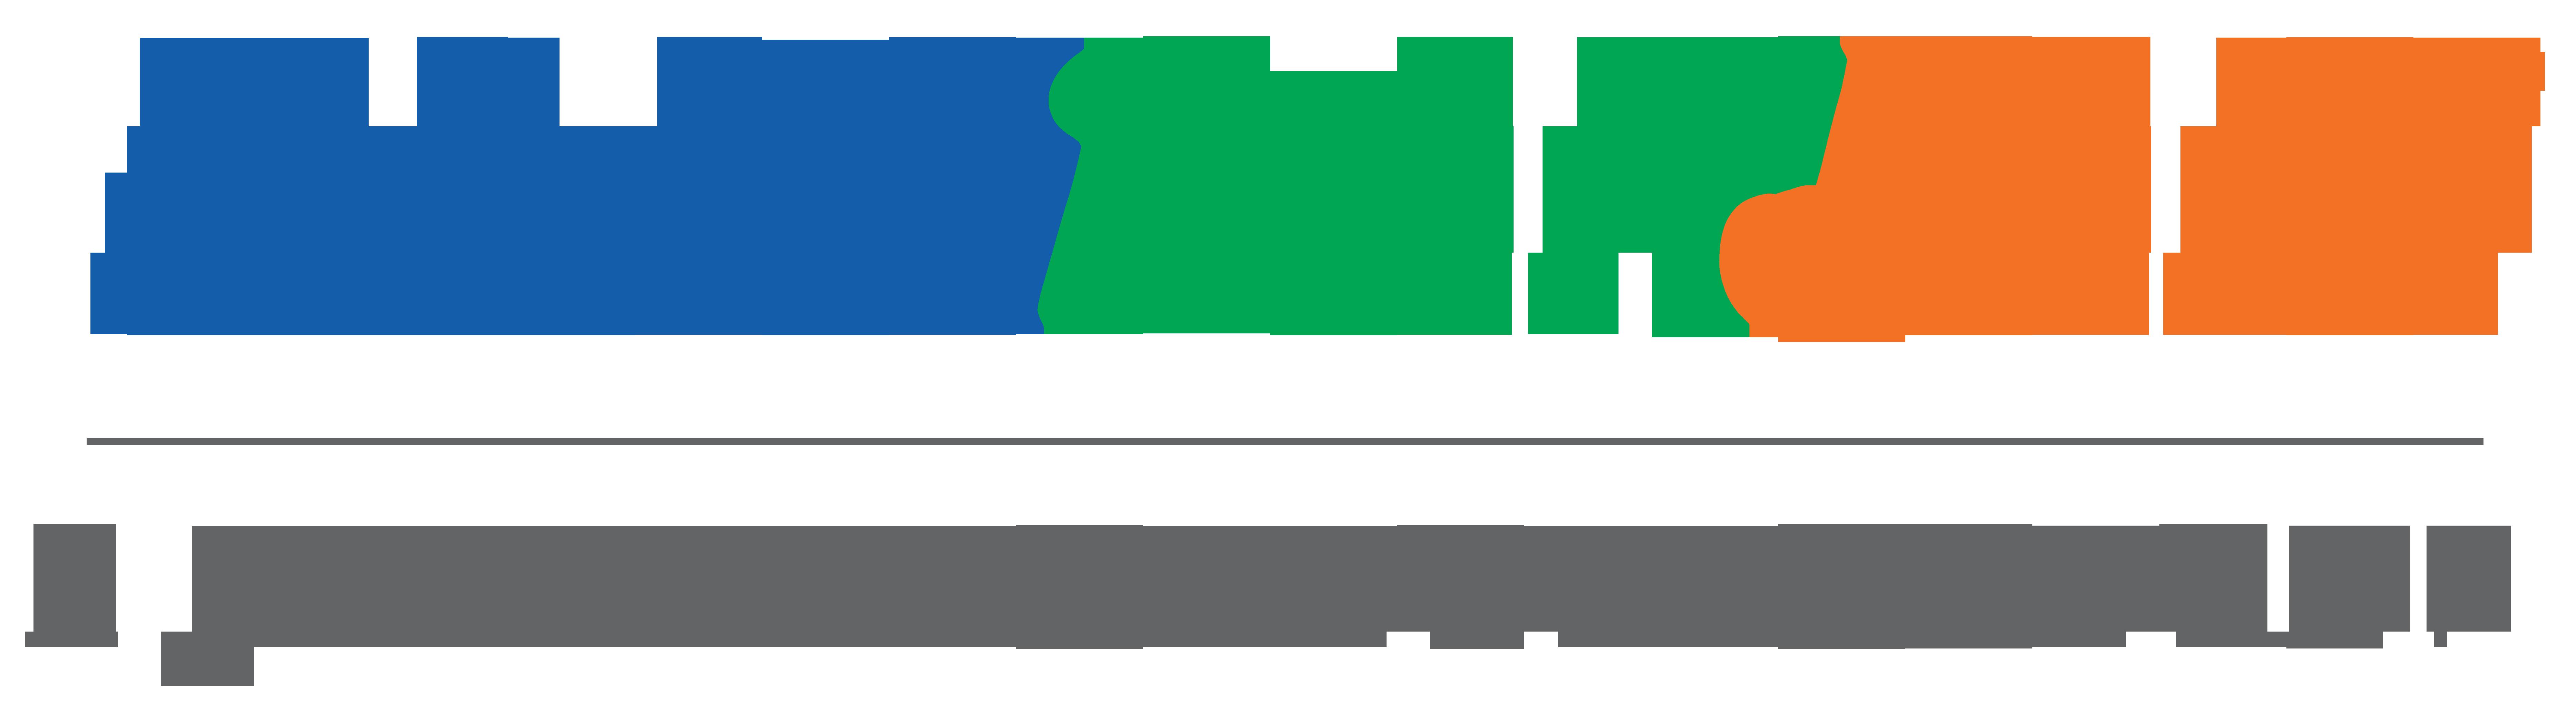 NaanDanJain